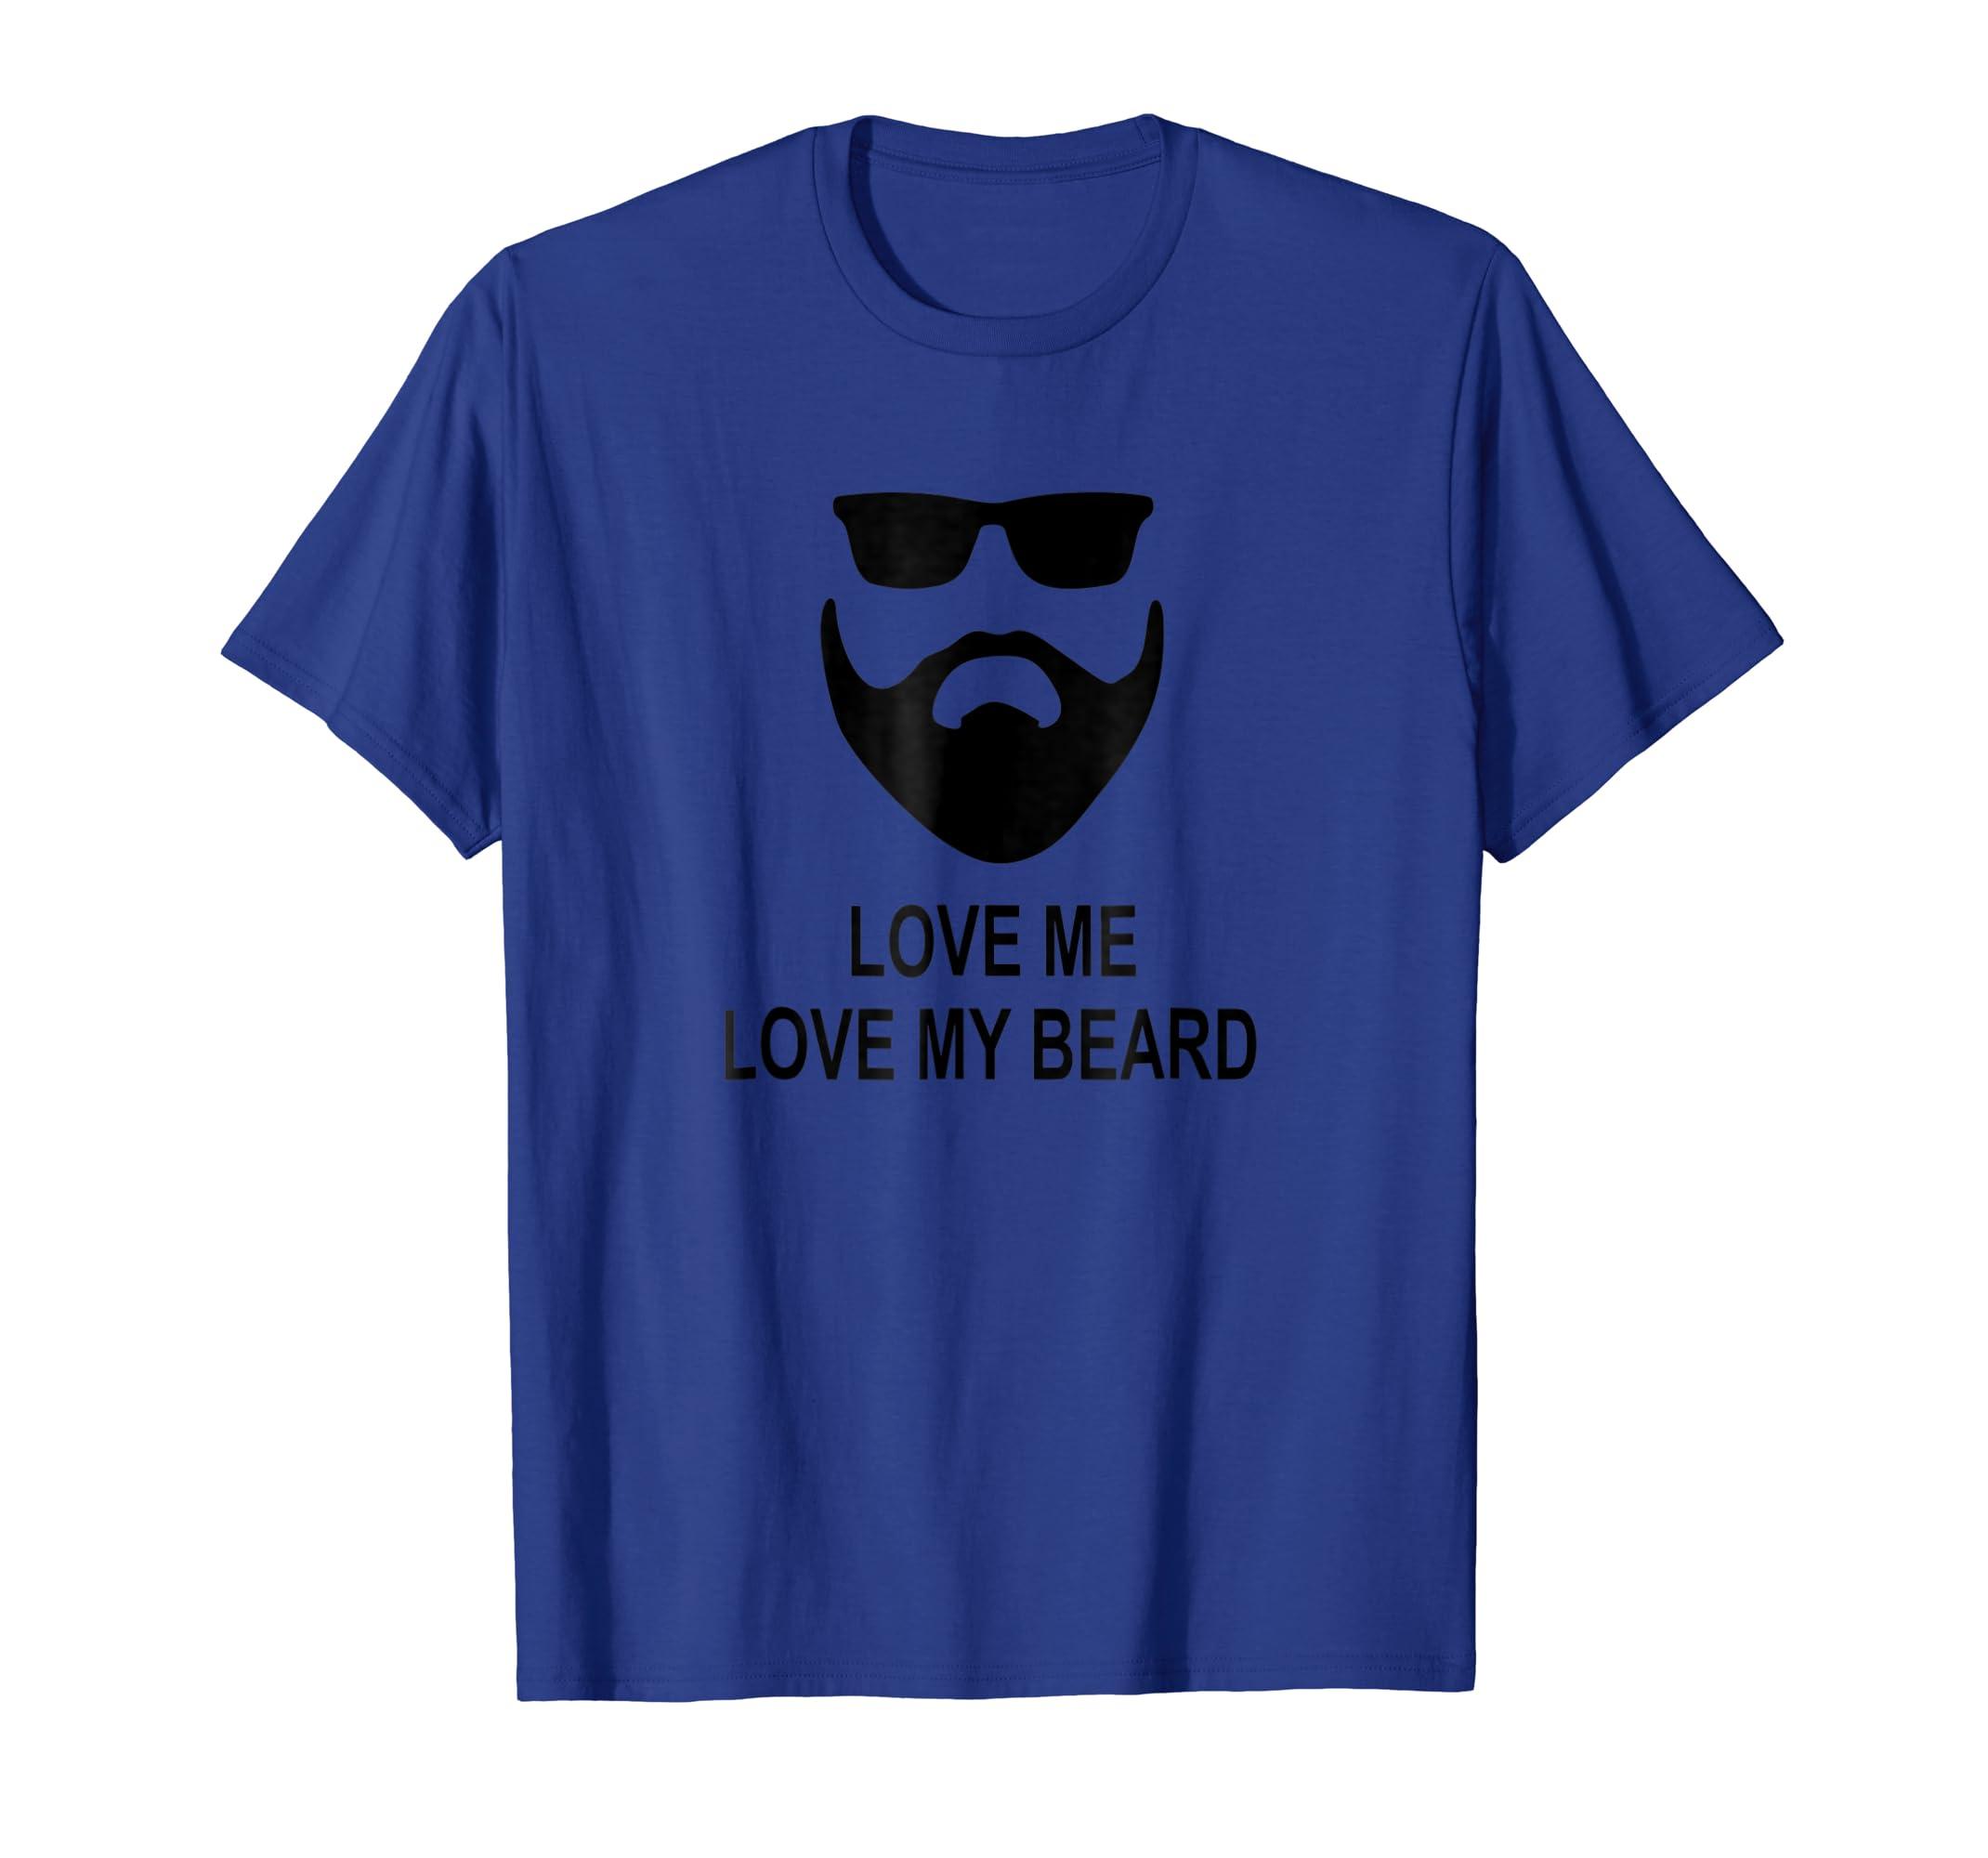 446ea88ddd Amazon.com: Mens Love Me Love My Beard Funn T-shirt: Clothing